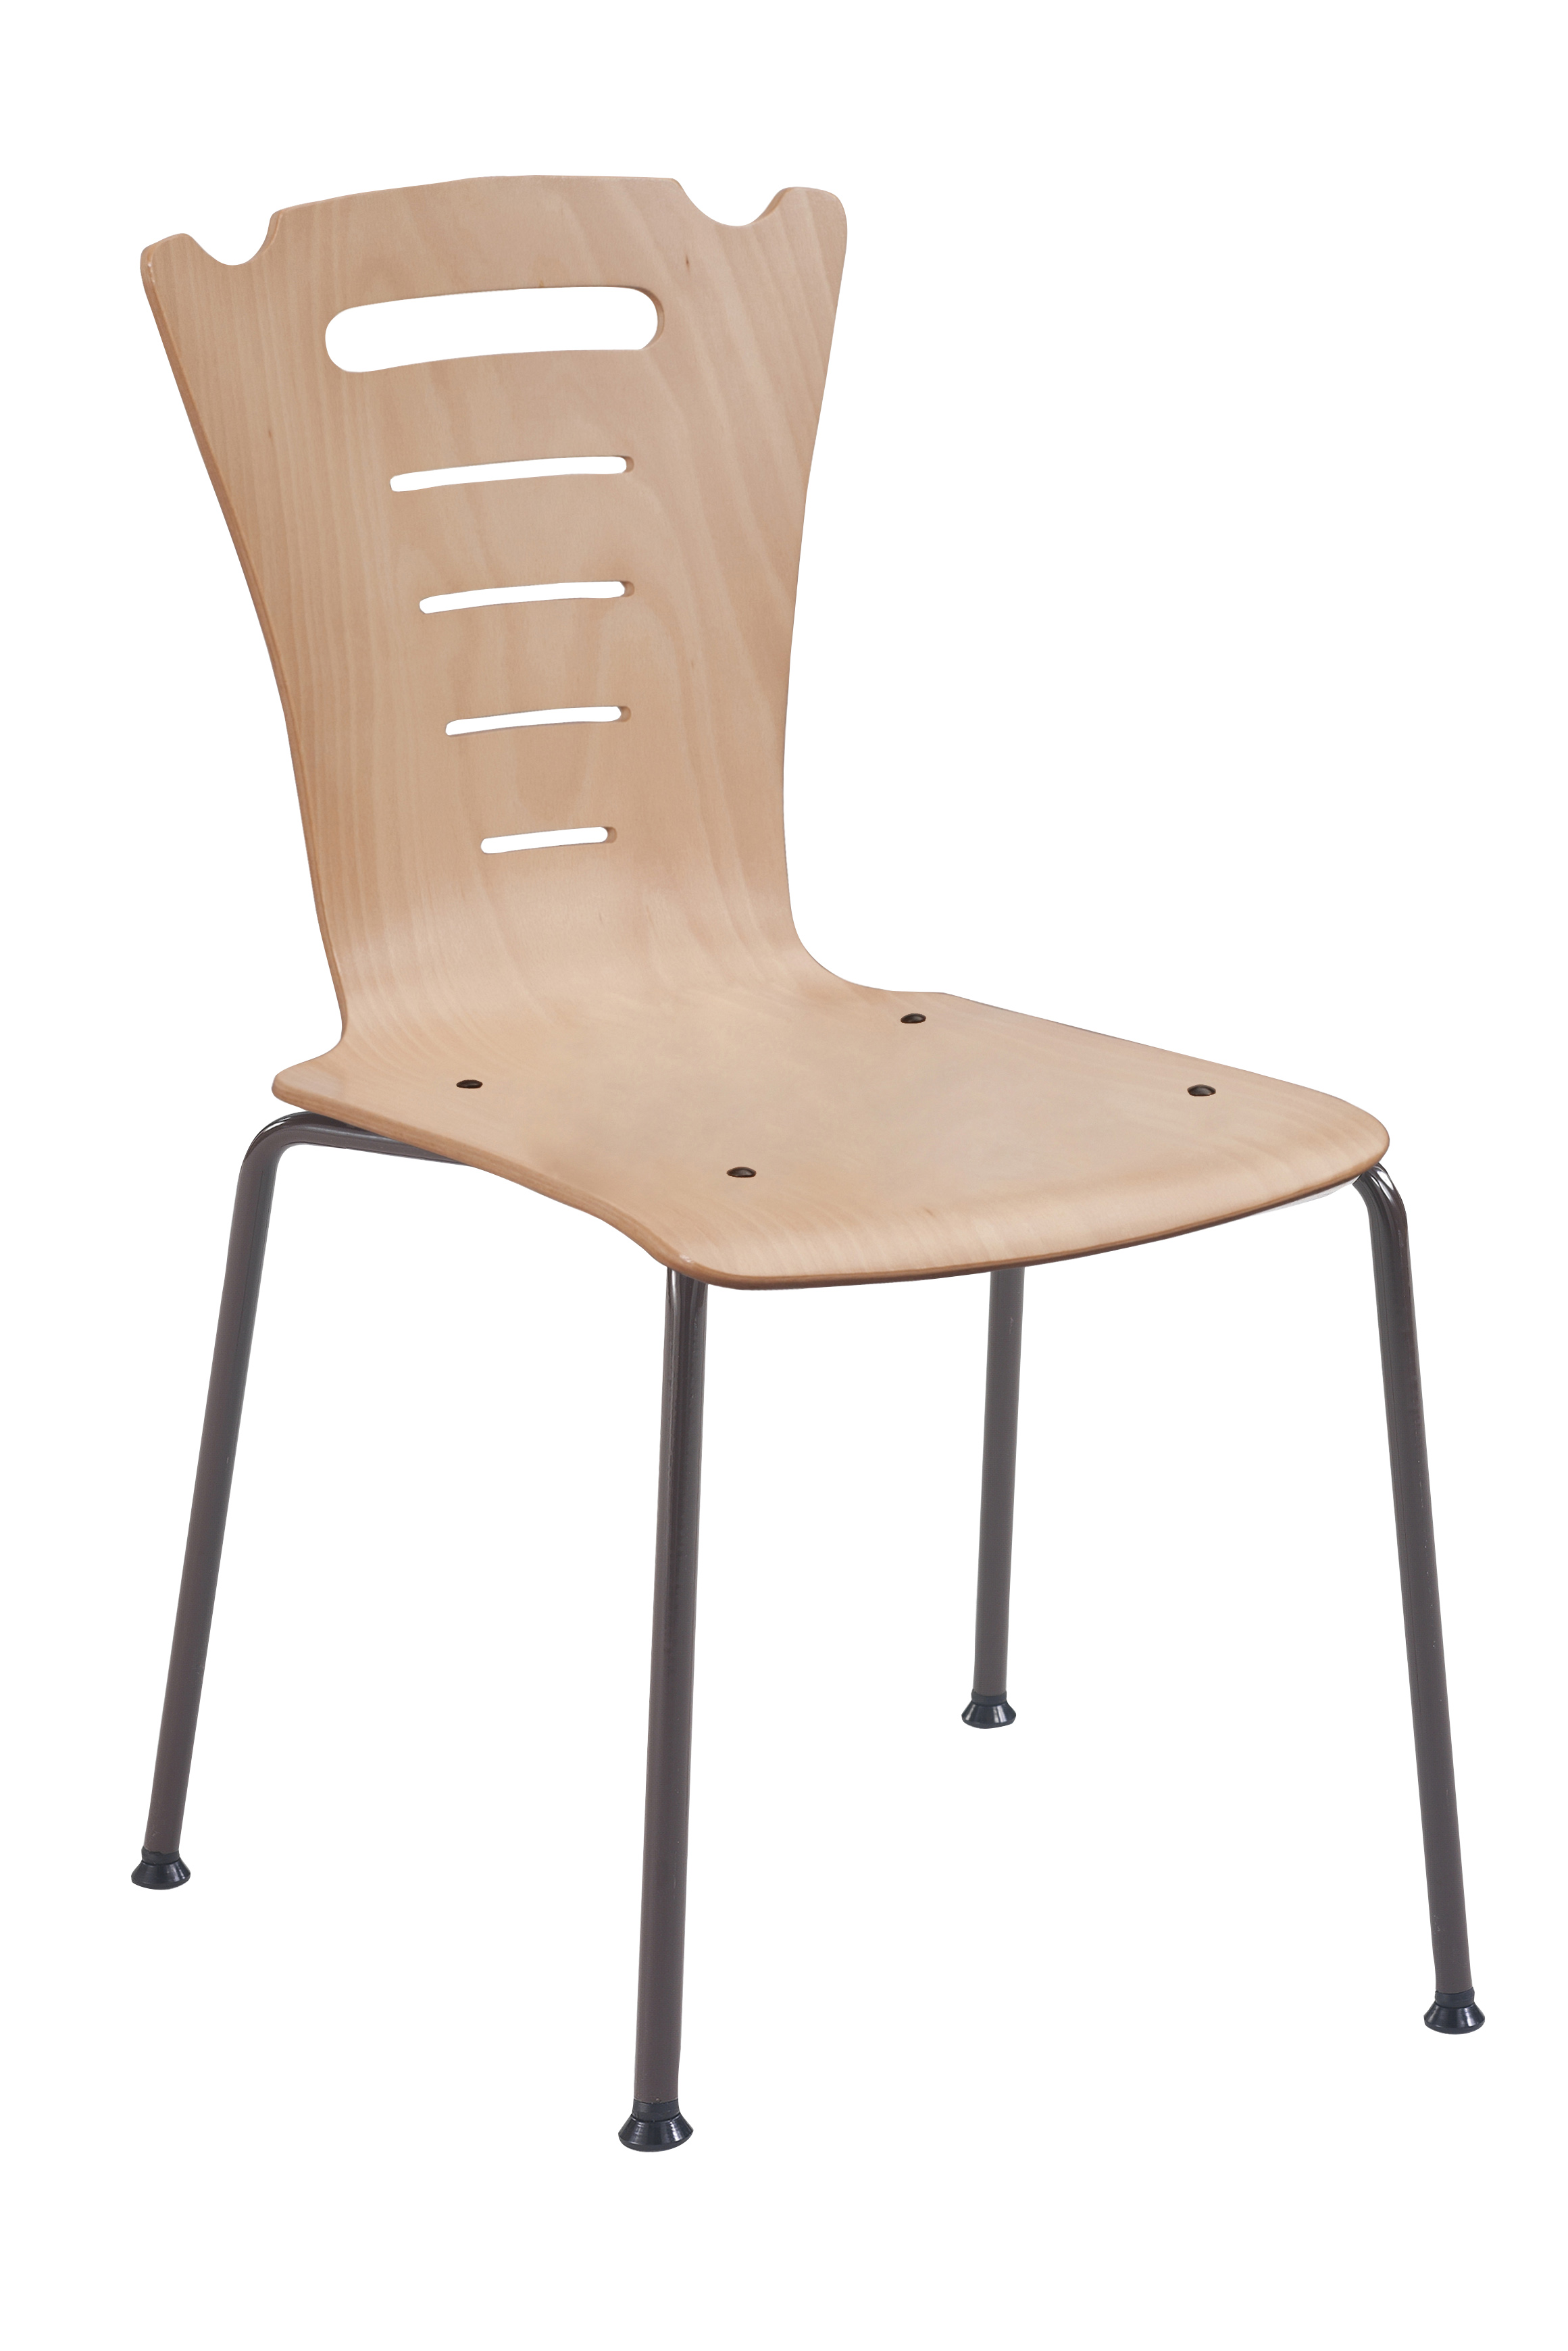 chaise coque bois 4 pieds 18 simire. Black Bedroom Furniture Sets. Home Design Ideas